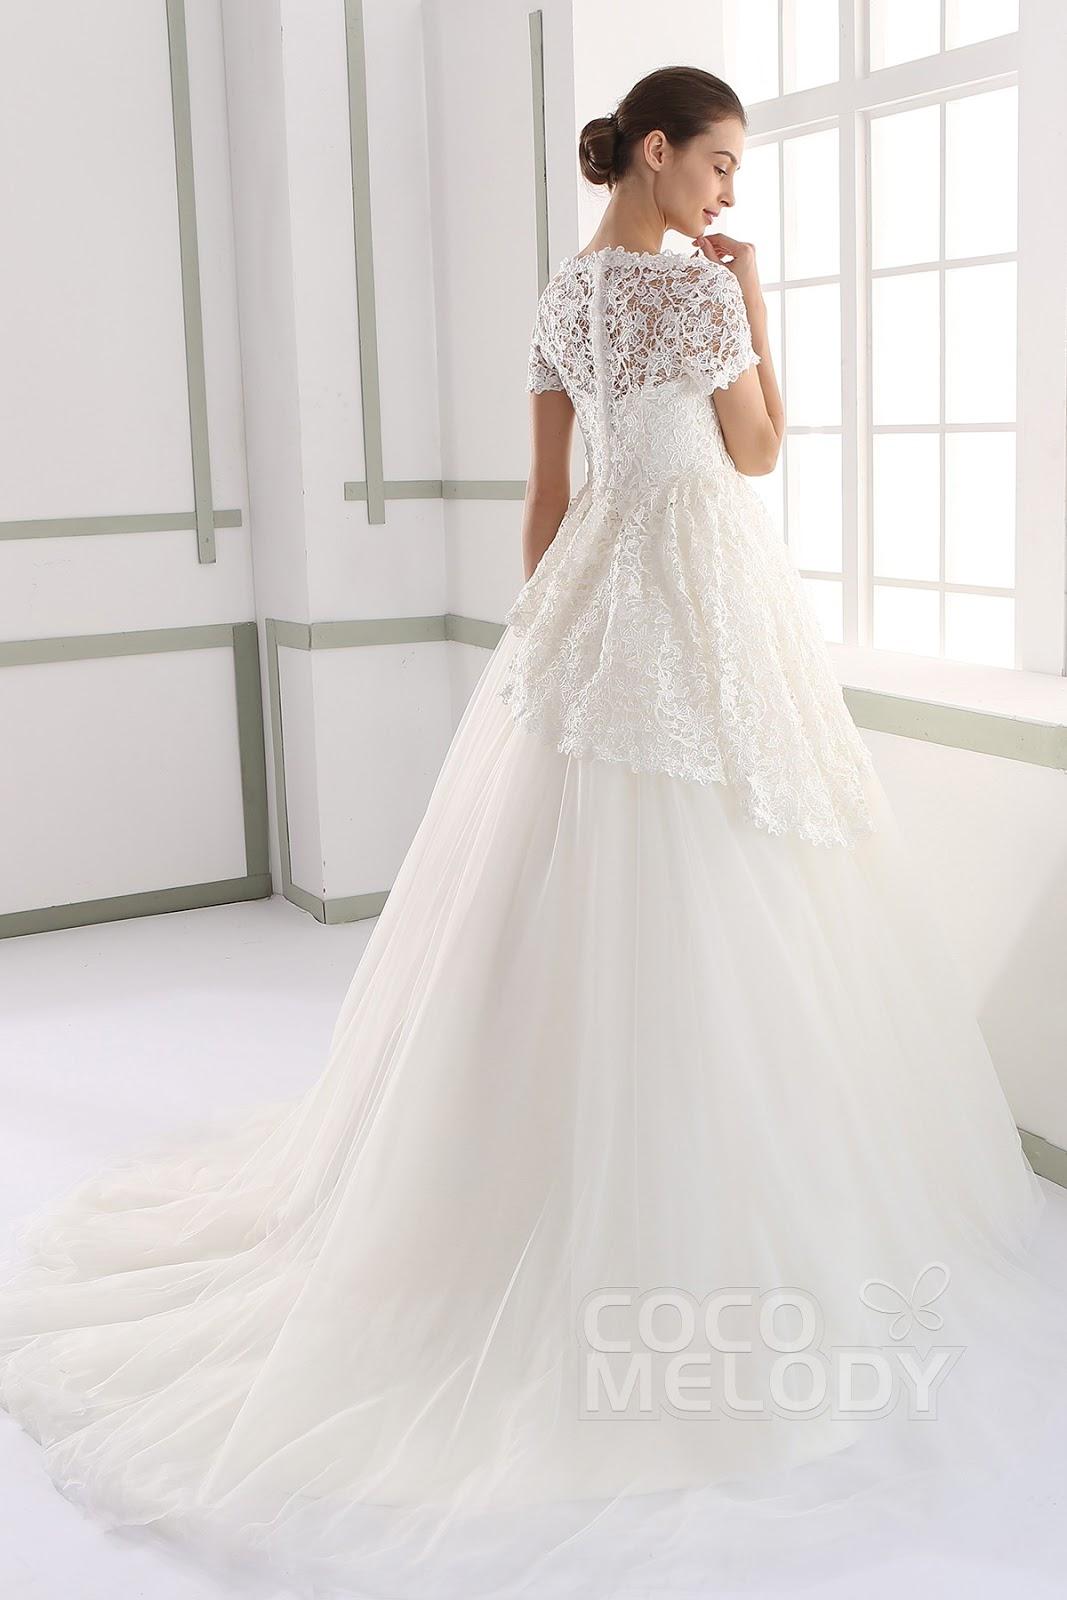 beautiful and elegant wedding dress: Great Wedding Dresses on your ...